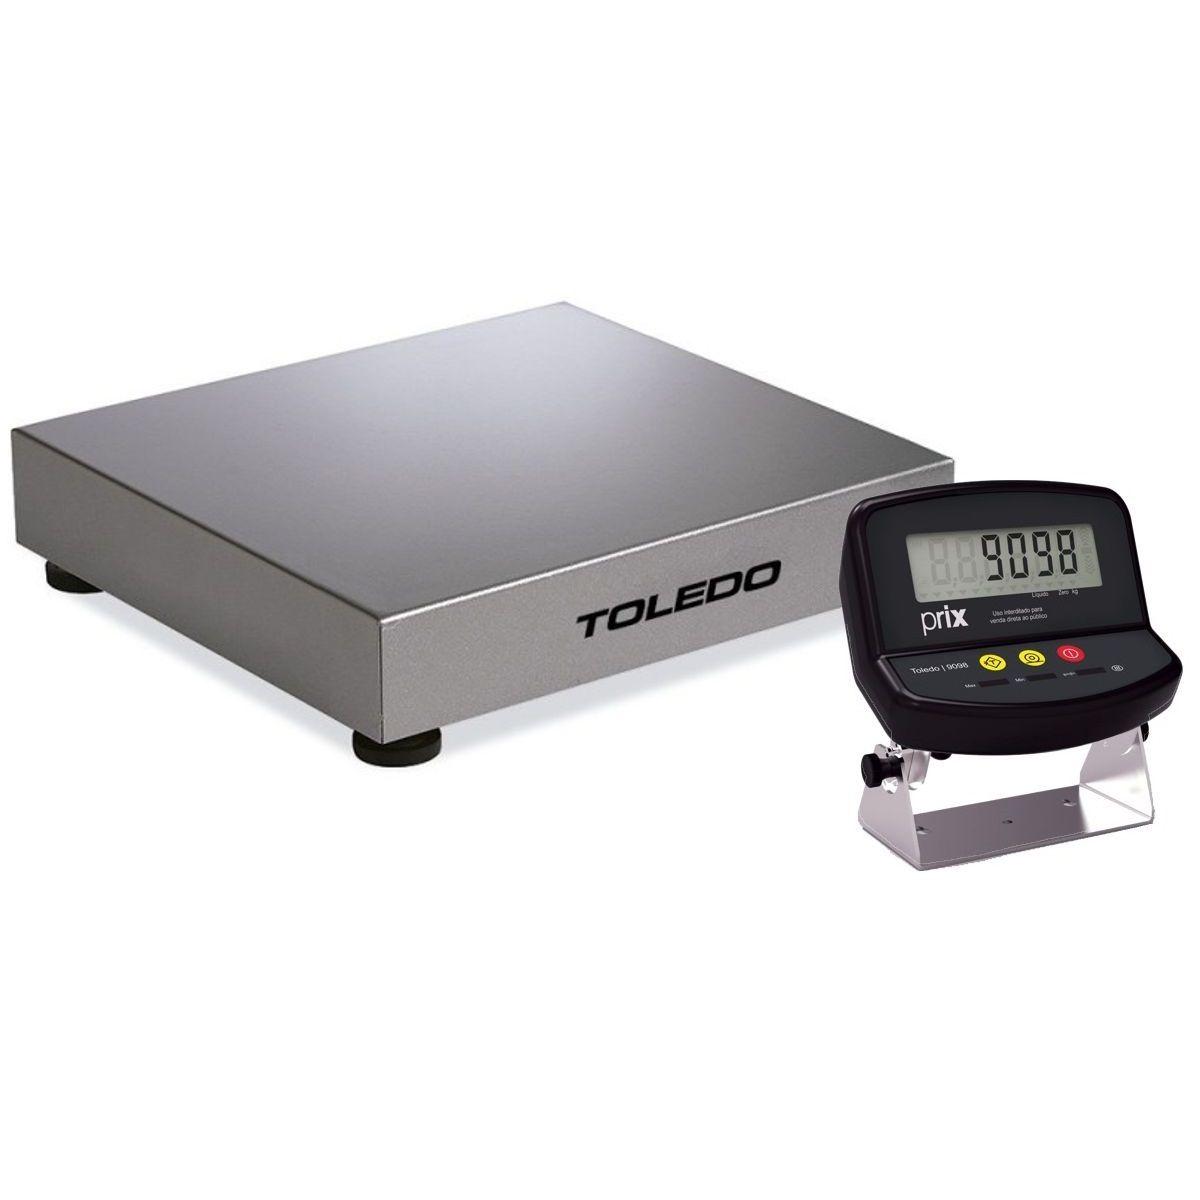 Balança de Plataforma Toledo 2098 (120Kgx20g) (50x50cm)